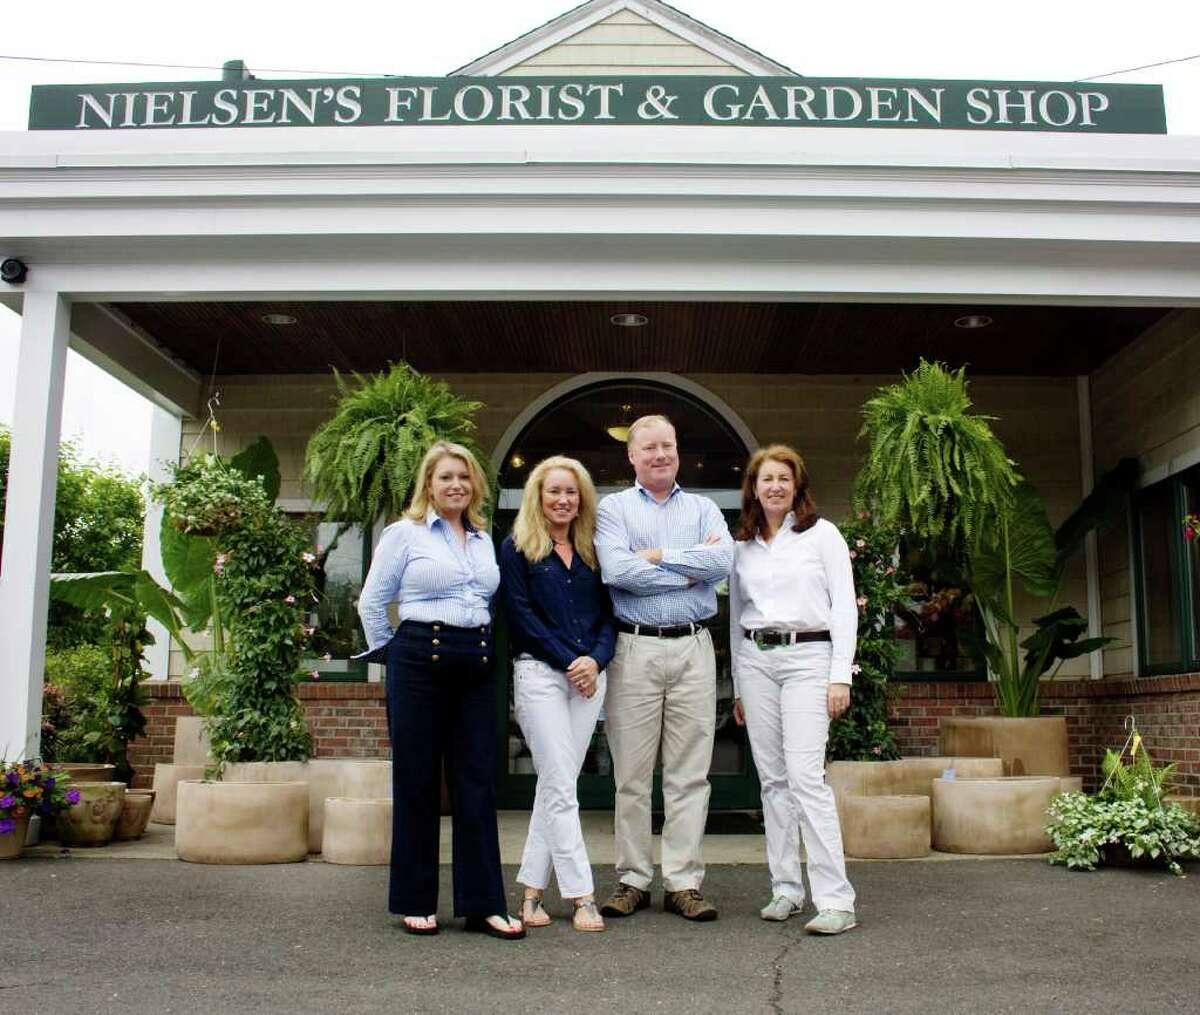 The owners of Nielsen's Florist & Garden Shop, from left, Tami Whittier, Karen Kuehler, Jerry Nielsen and Sandy Nielsen-Baumann.